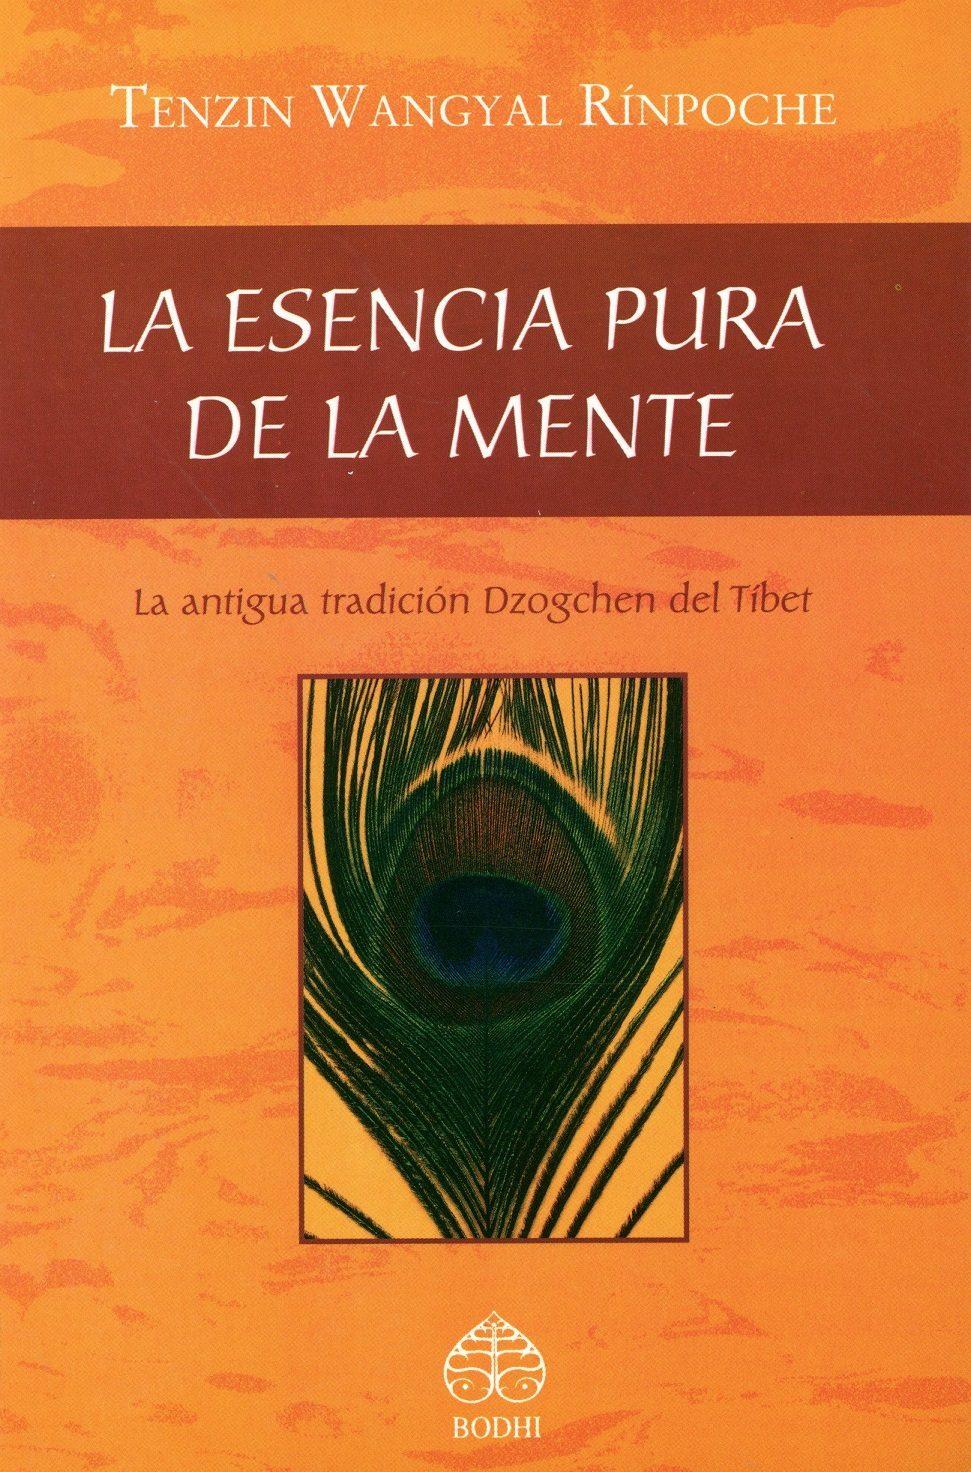 La Esencia Pura De La Mente: La Anigua Tradicion Dzogchen Del Tib Et por Tenzin Wangyal Rinpoche